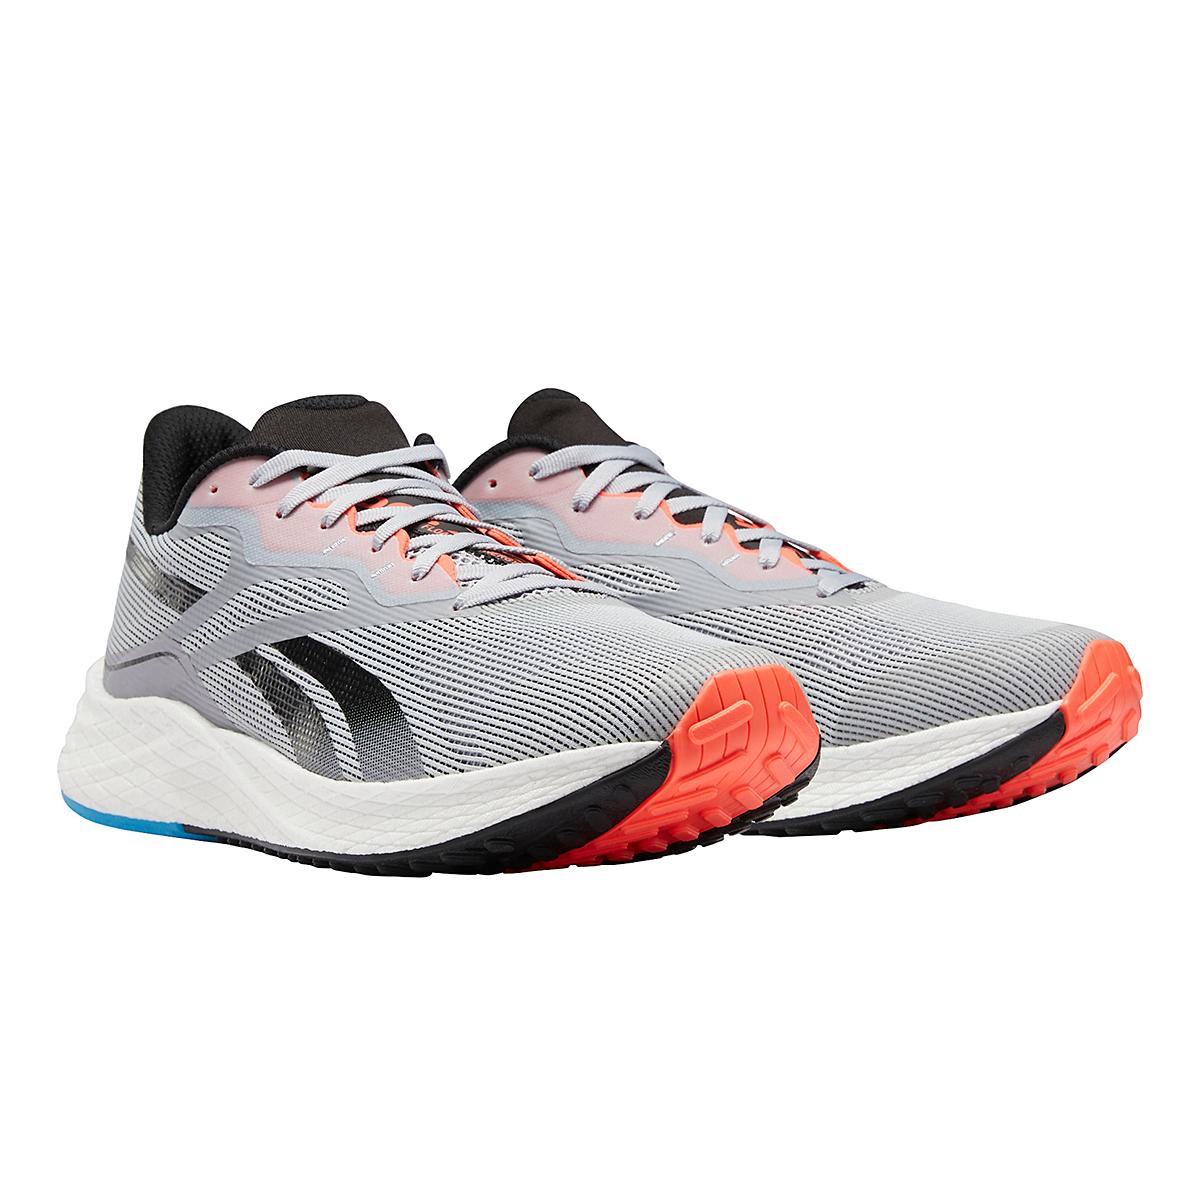 Men's Reebok Floatride Energy 3.0 Running Shoe - Color: Cold Grey/Core Black/Orange Flare - Size: 7 - Width: Regular, Cold Grey/Core Black/Orange Flare, large, image 4